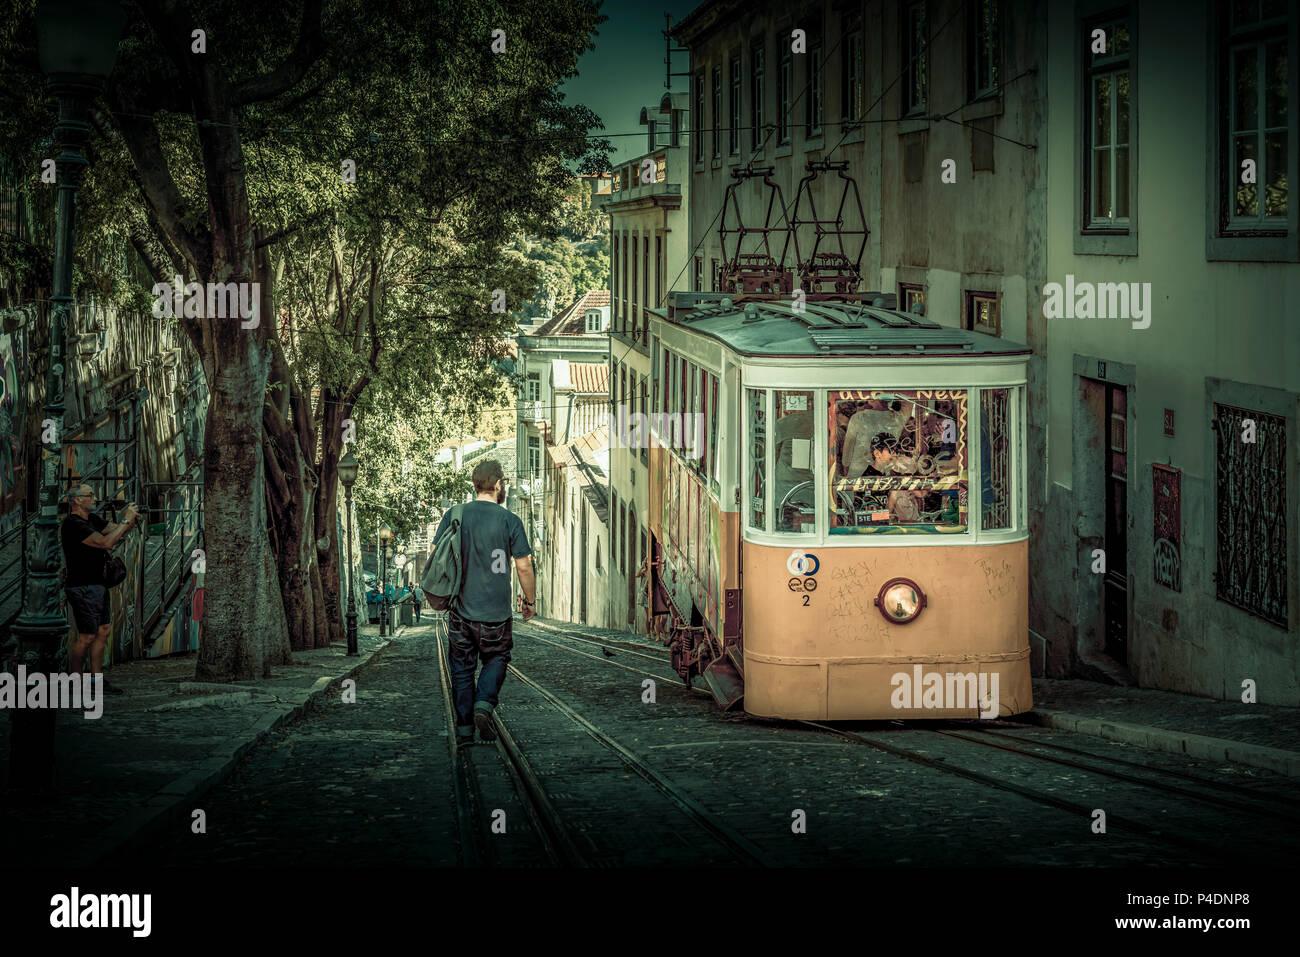 Europa, Portugal, Lissabon, Transport, Tram, Trambahn, Straßenbahn Stock Photo